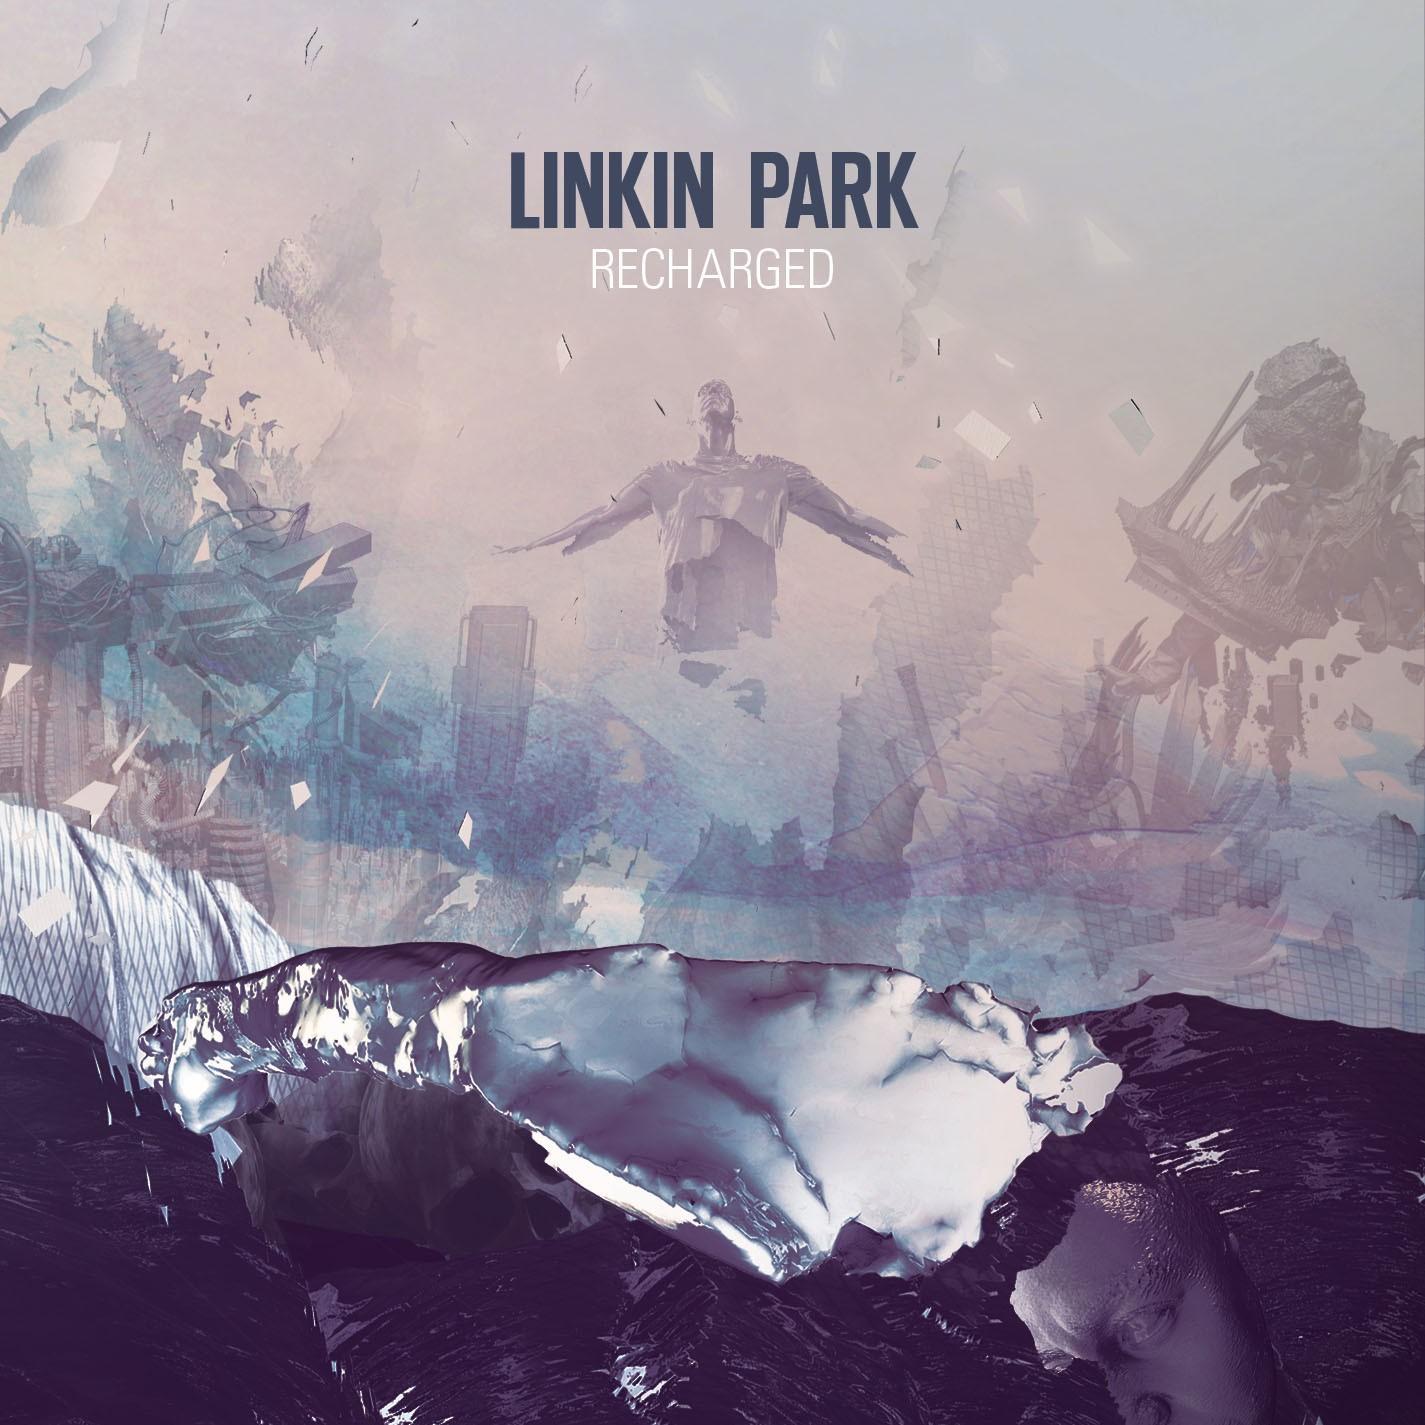 Linkin Park - Recharged 2XLP